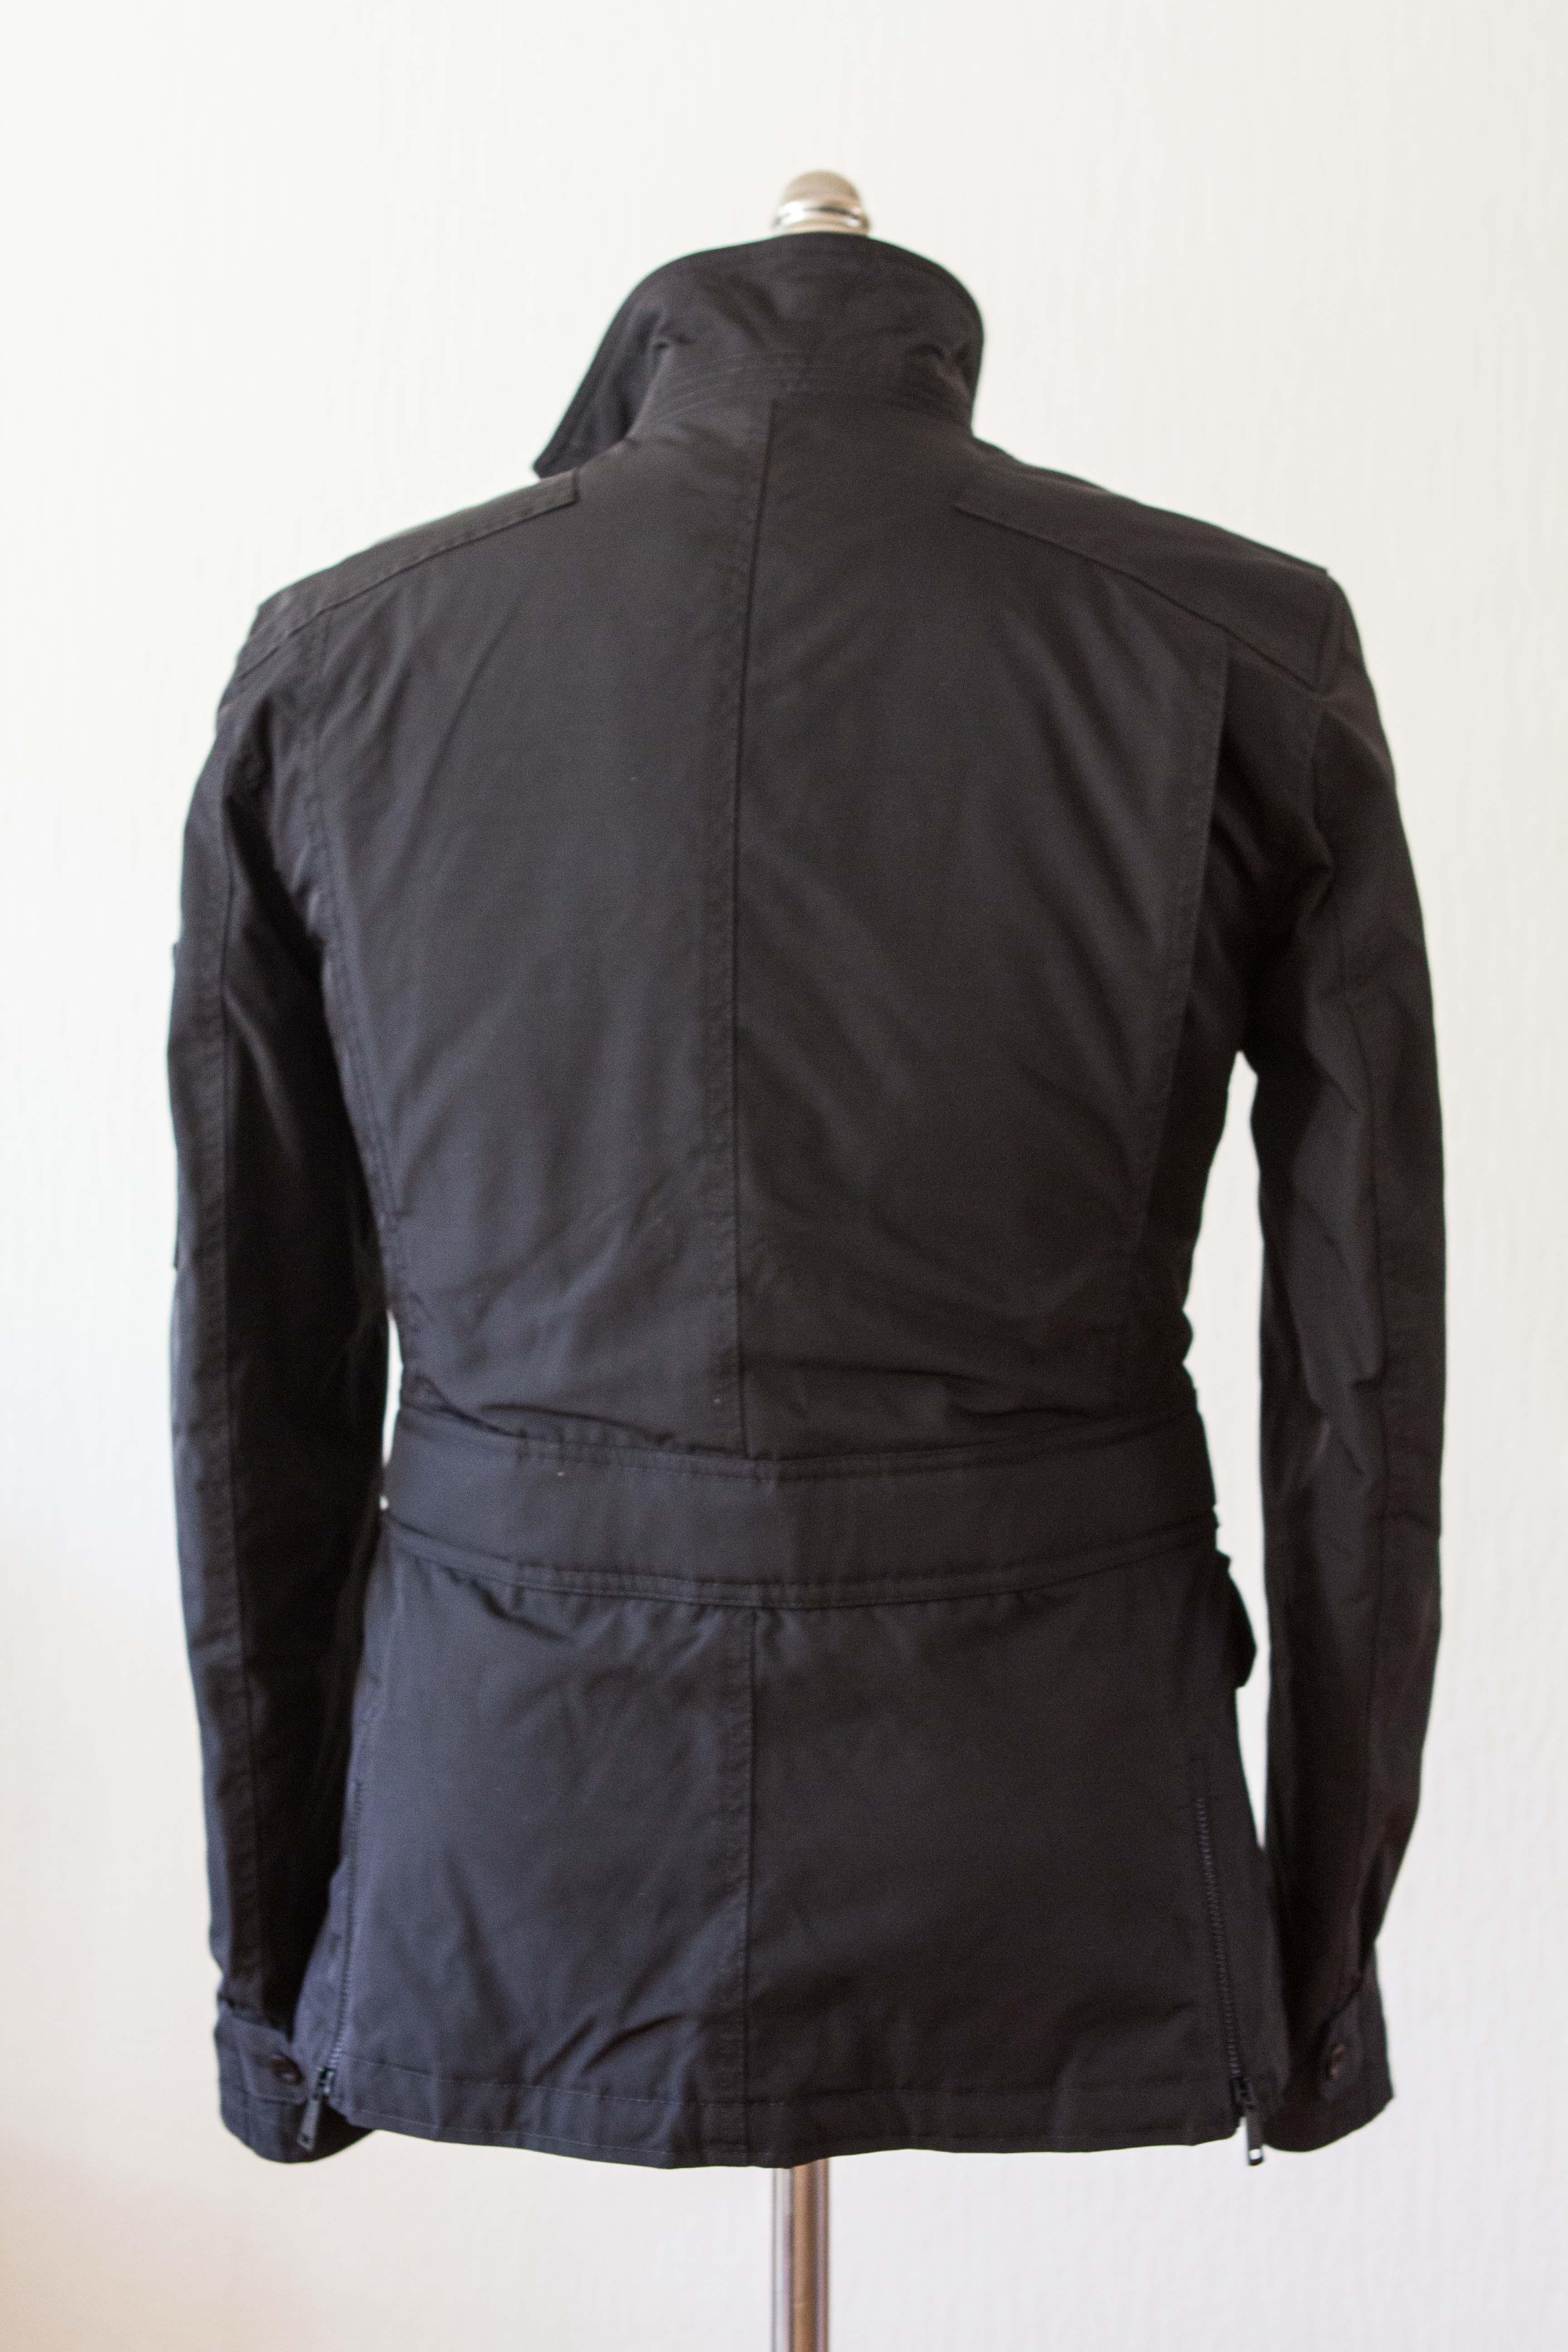 Military sc-lined-jacket - 04.jpg